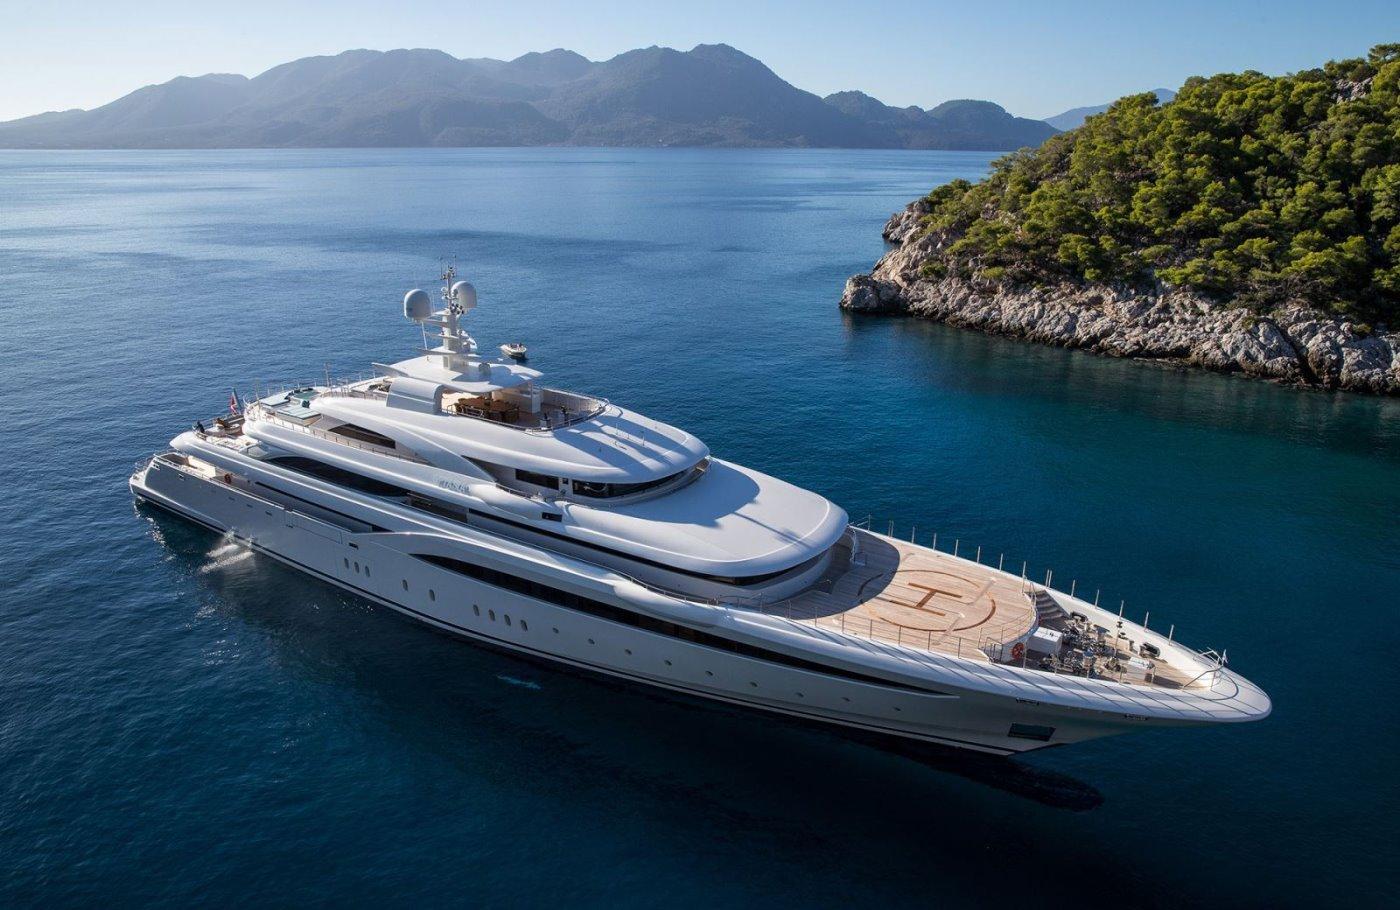 Motor Yacht Charter Greece